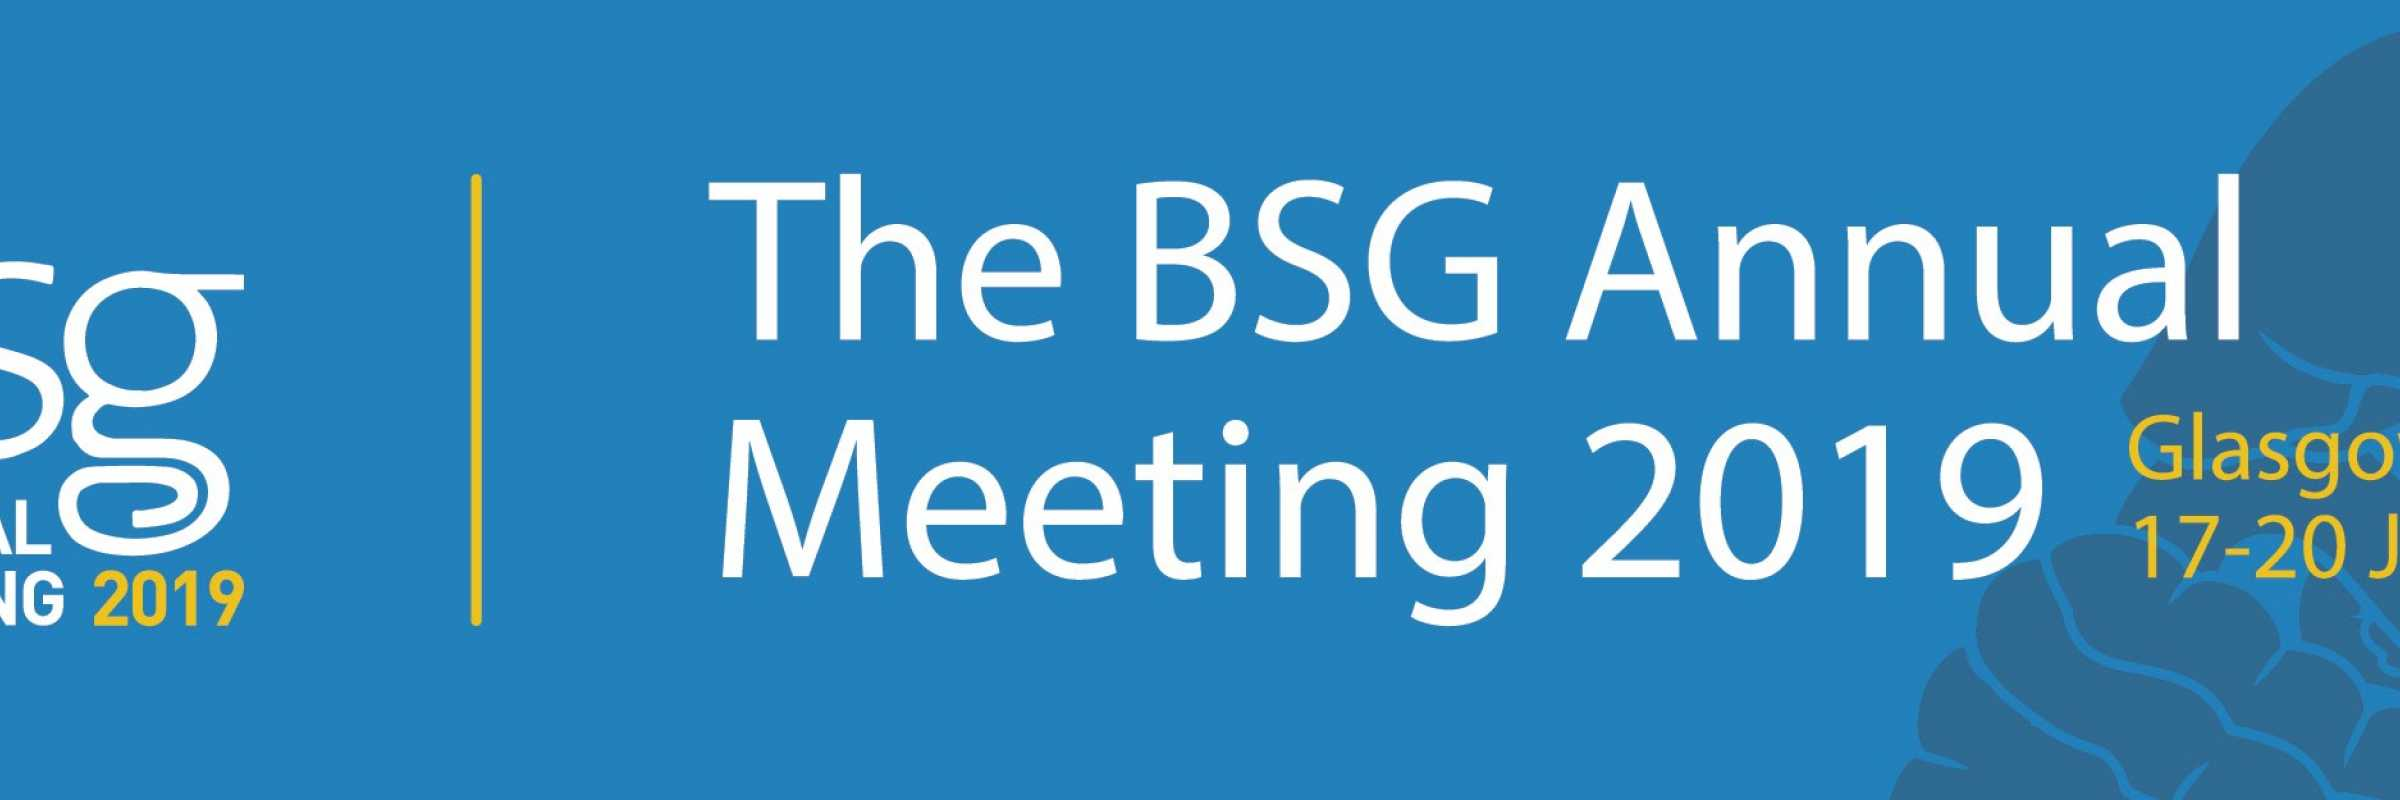 The British Society of Gastroenterology